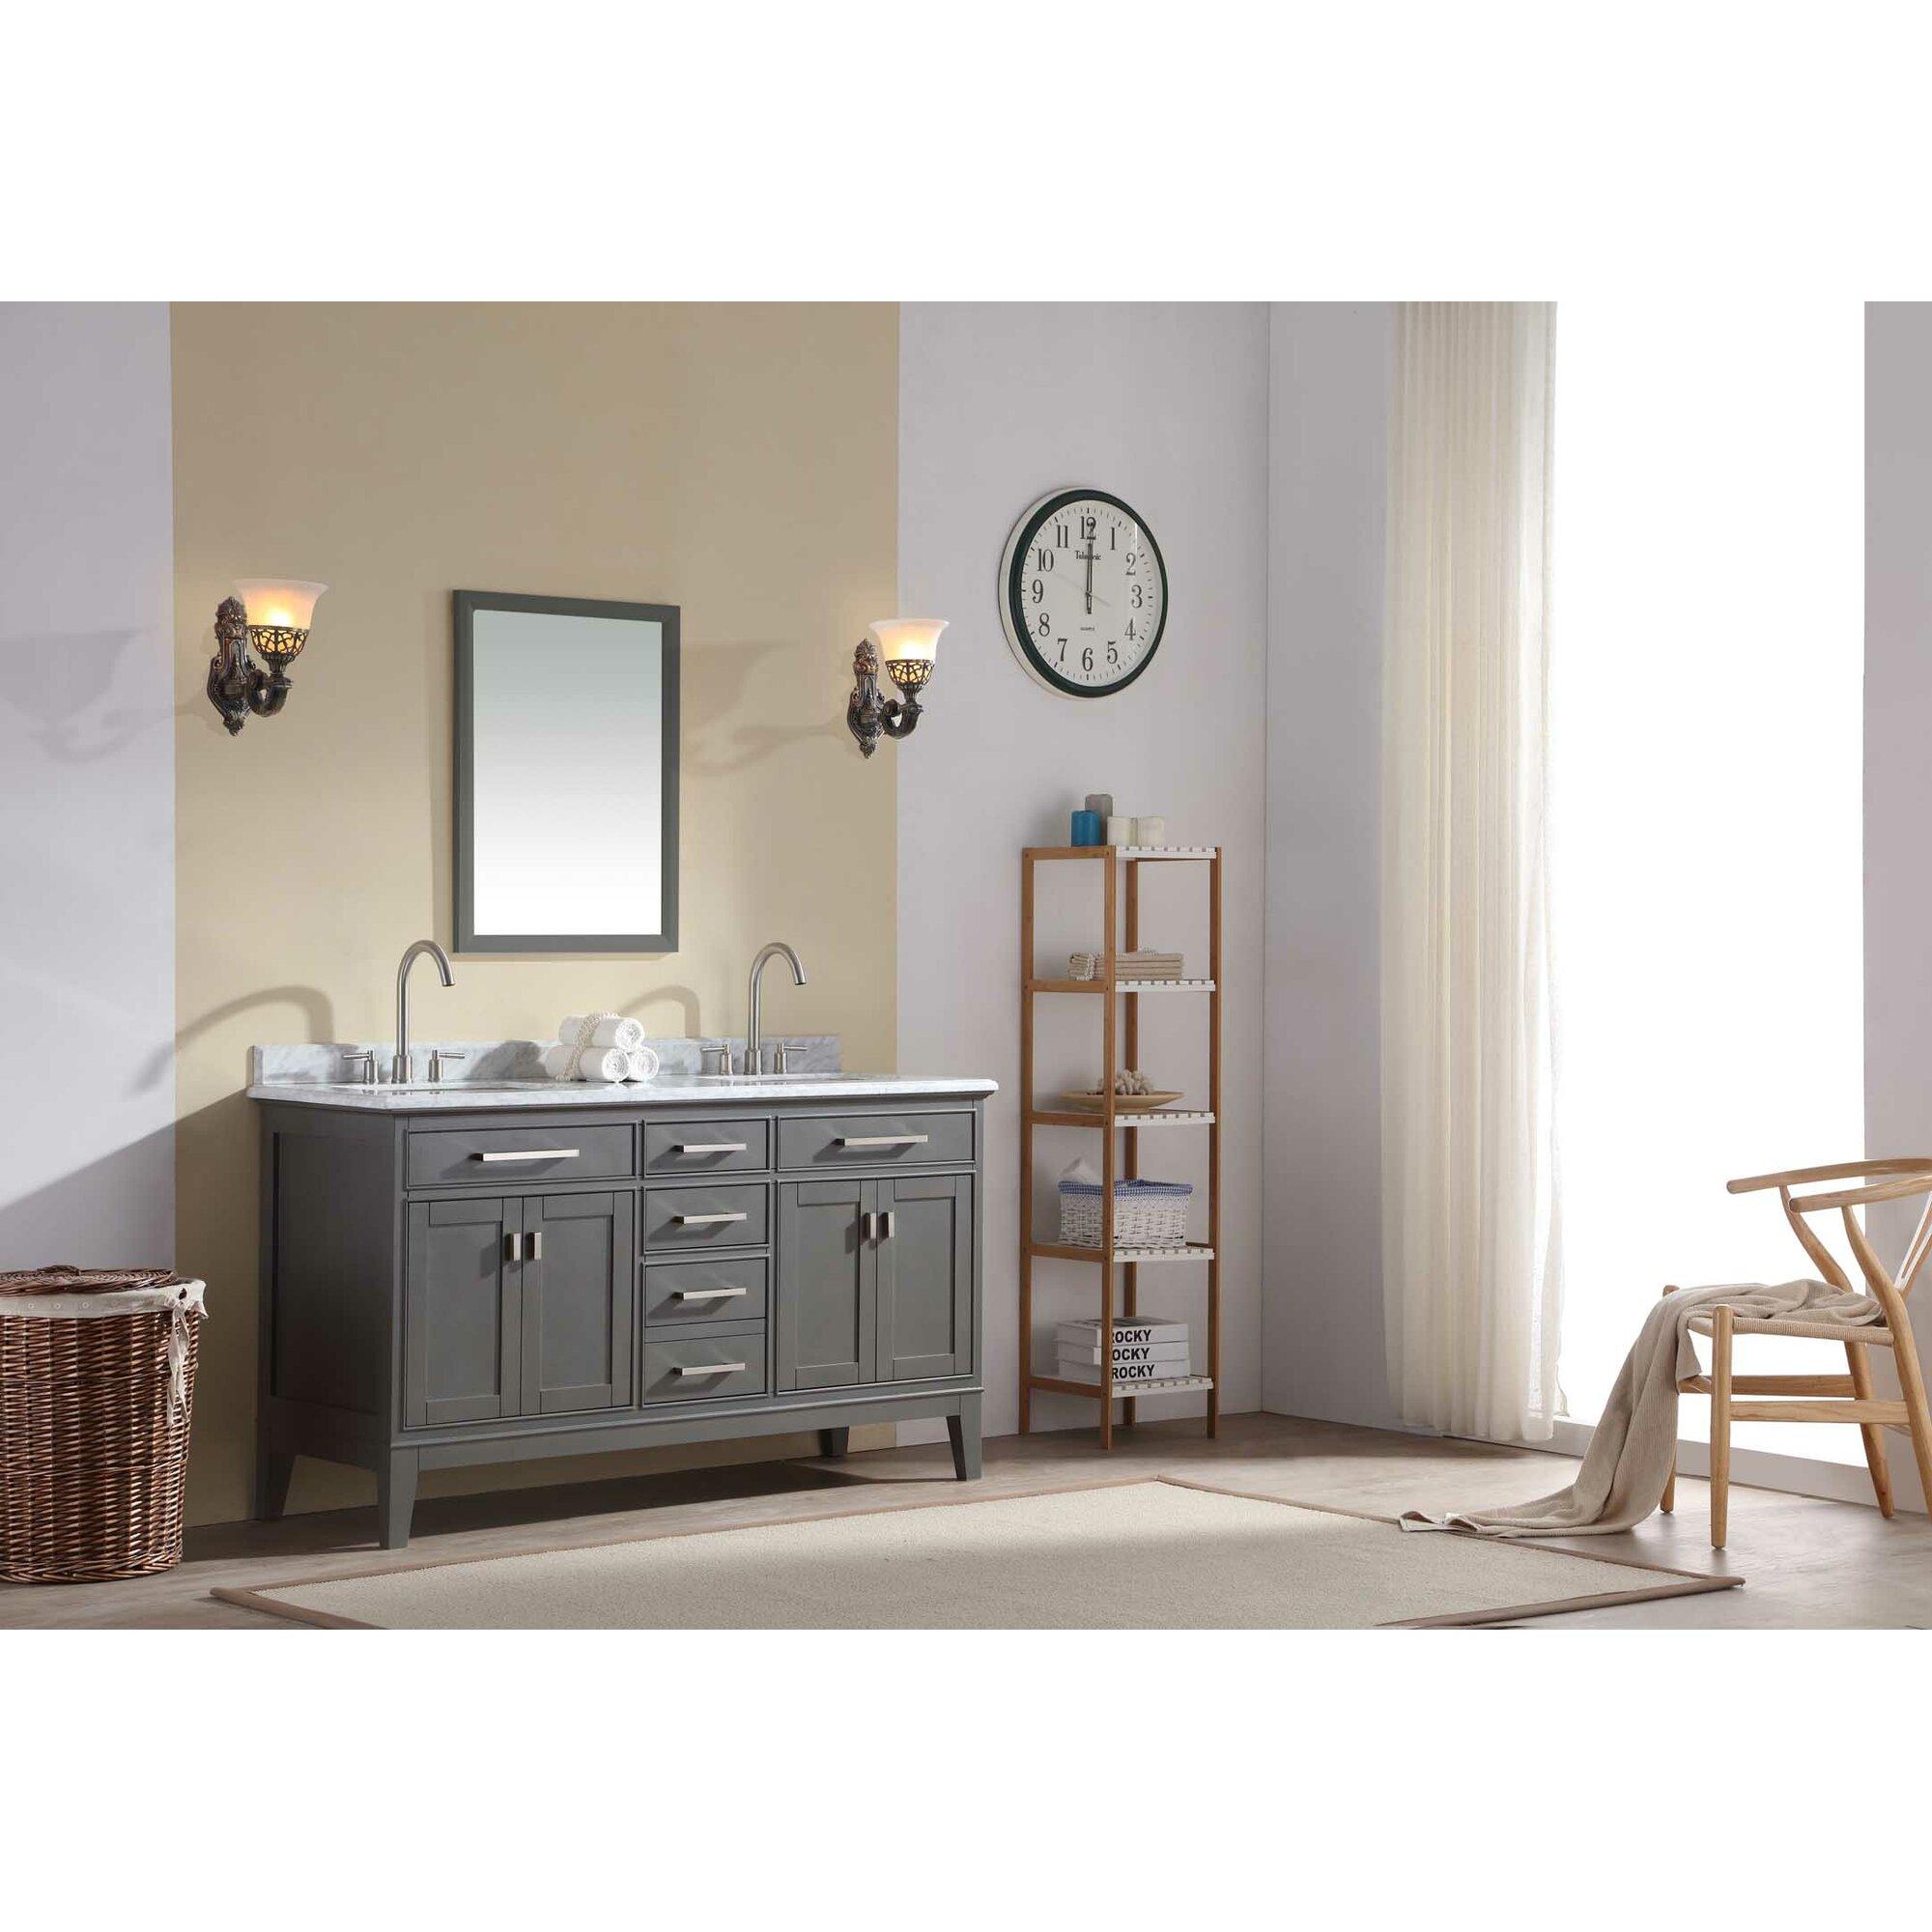 danny 60 double bathroom vanity set - Bathroom Vanity Double